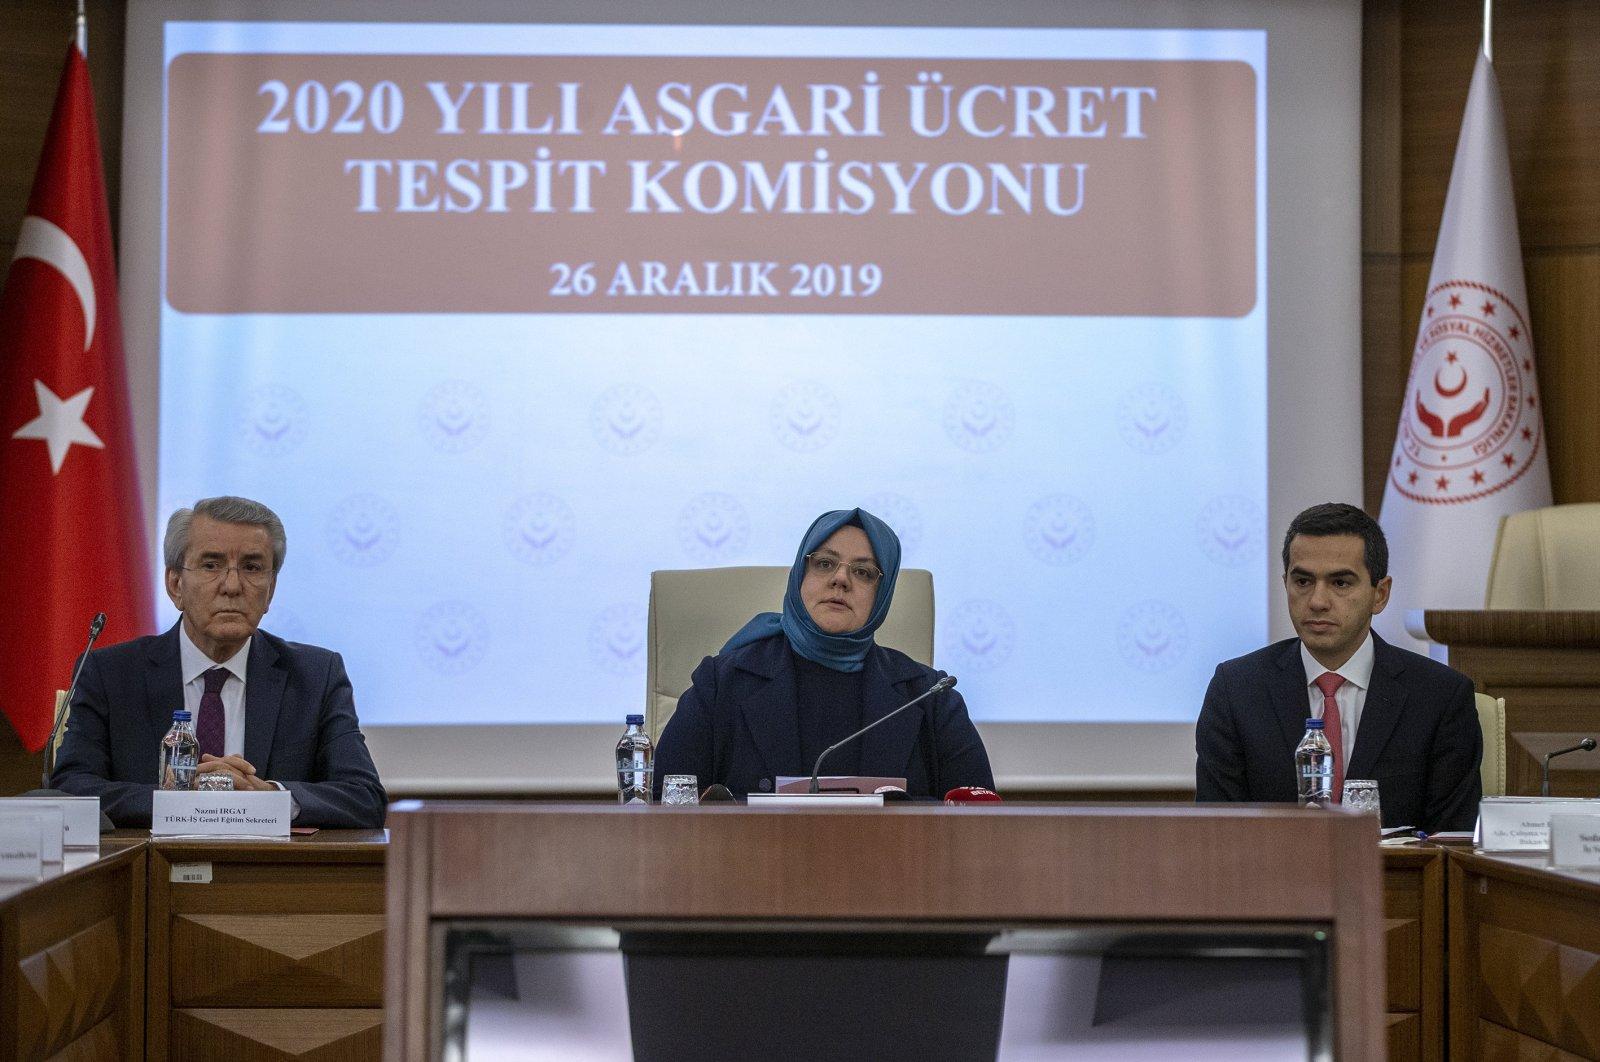 TÜRK-IŞ Secretary-General Nazmi Irgat (L), Minister of Family, Labor and Social Services Zehra Zümrüt Selçuk (C) and TISK head Özgür Burak Akkol (R) sit next to each other during a Minimum Wage Determination Commission meeting for the year 2020, Ankara, Turkey, Dec. 26, 2019. (AA Photo)